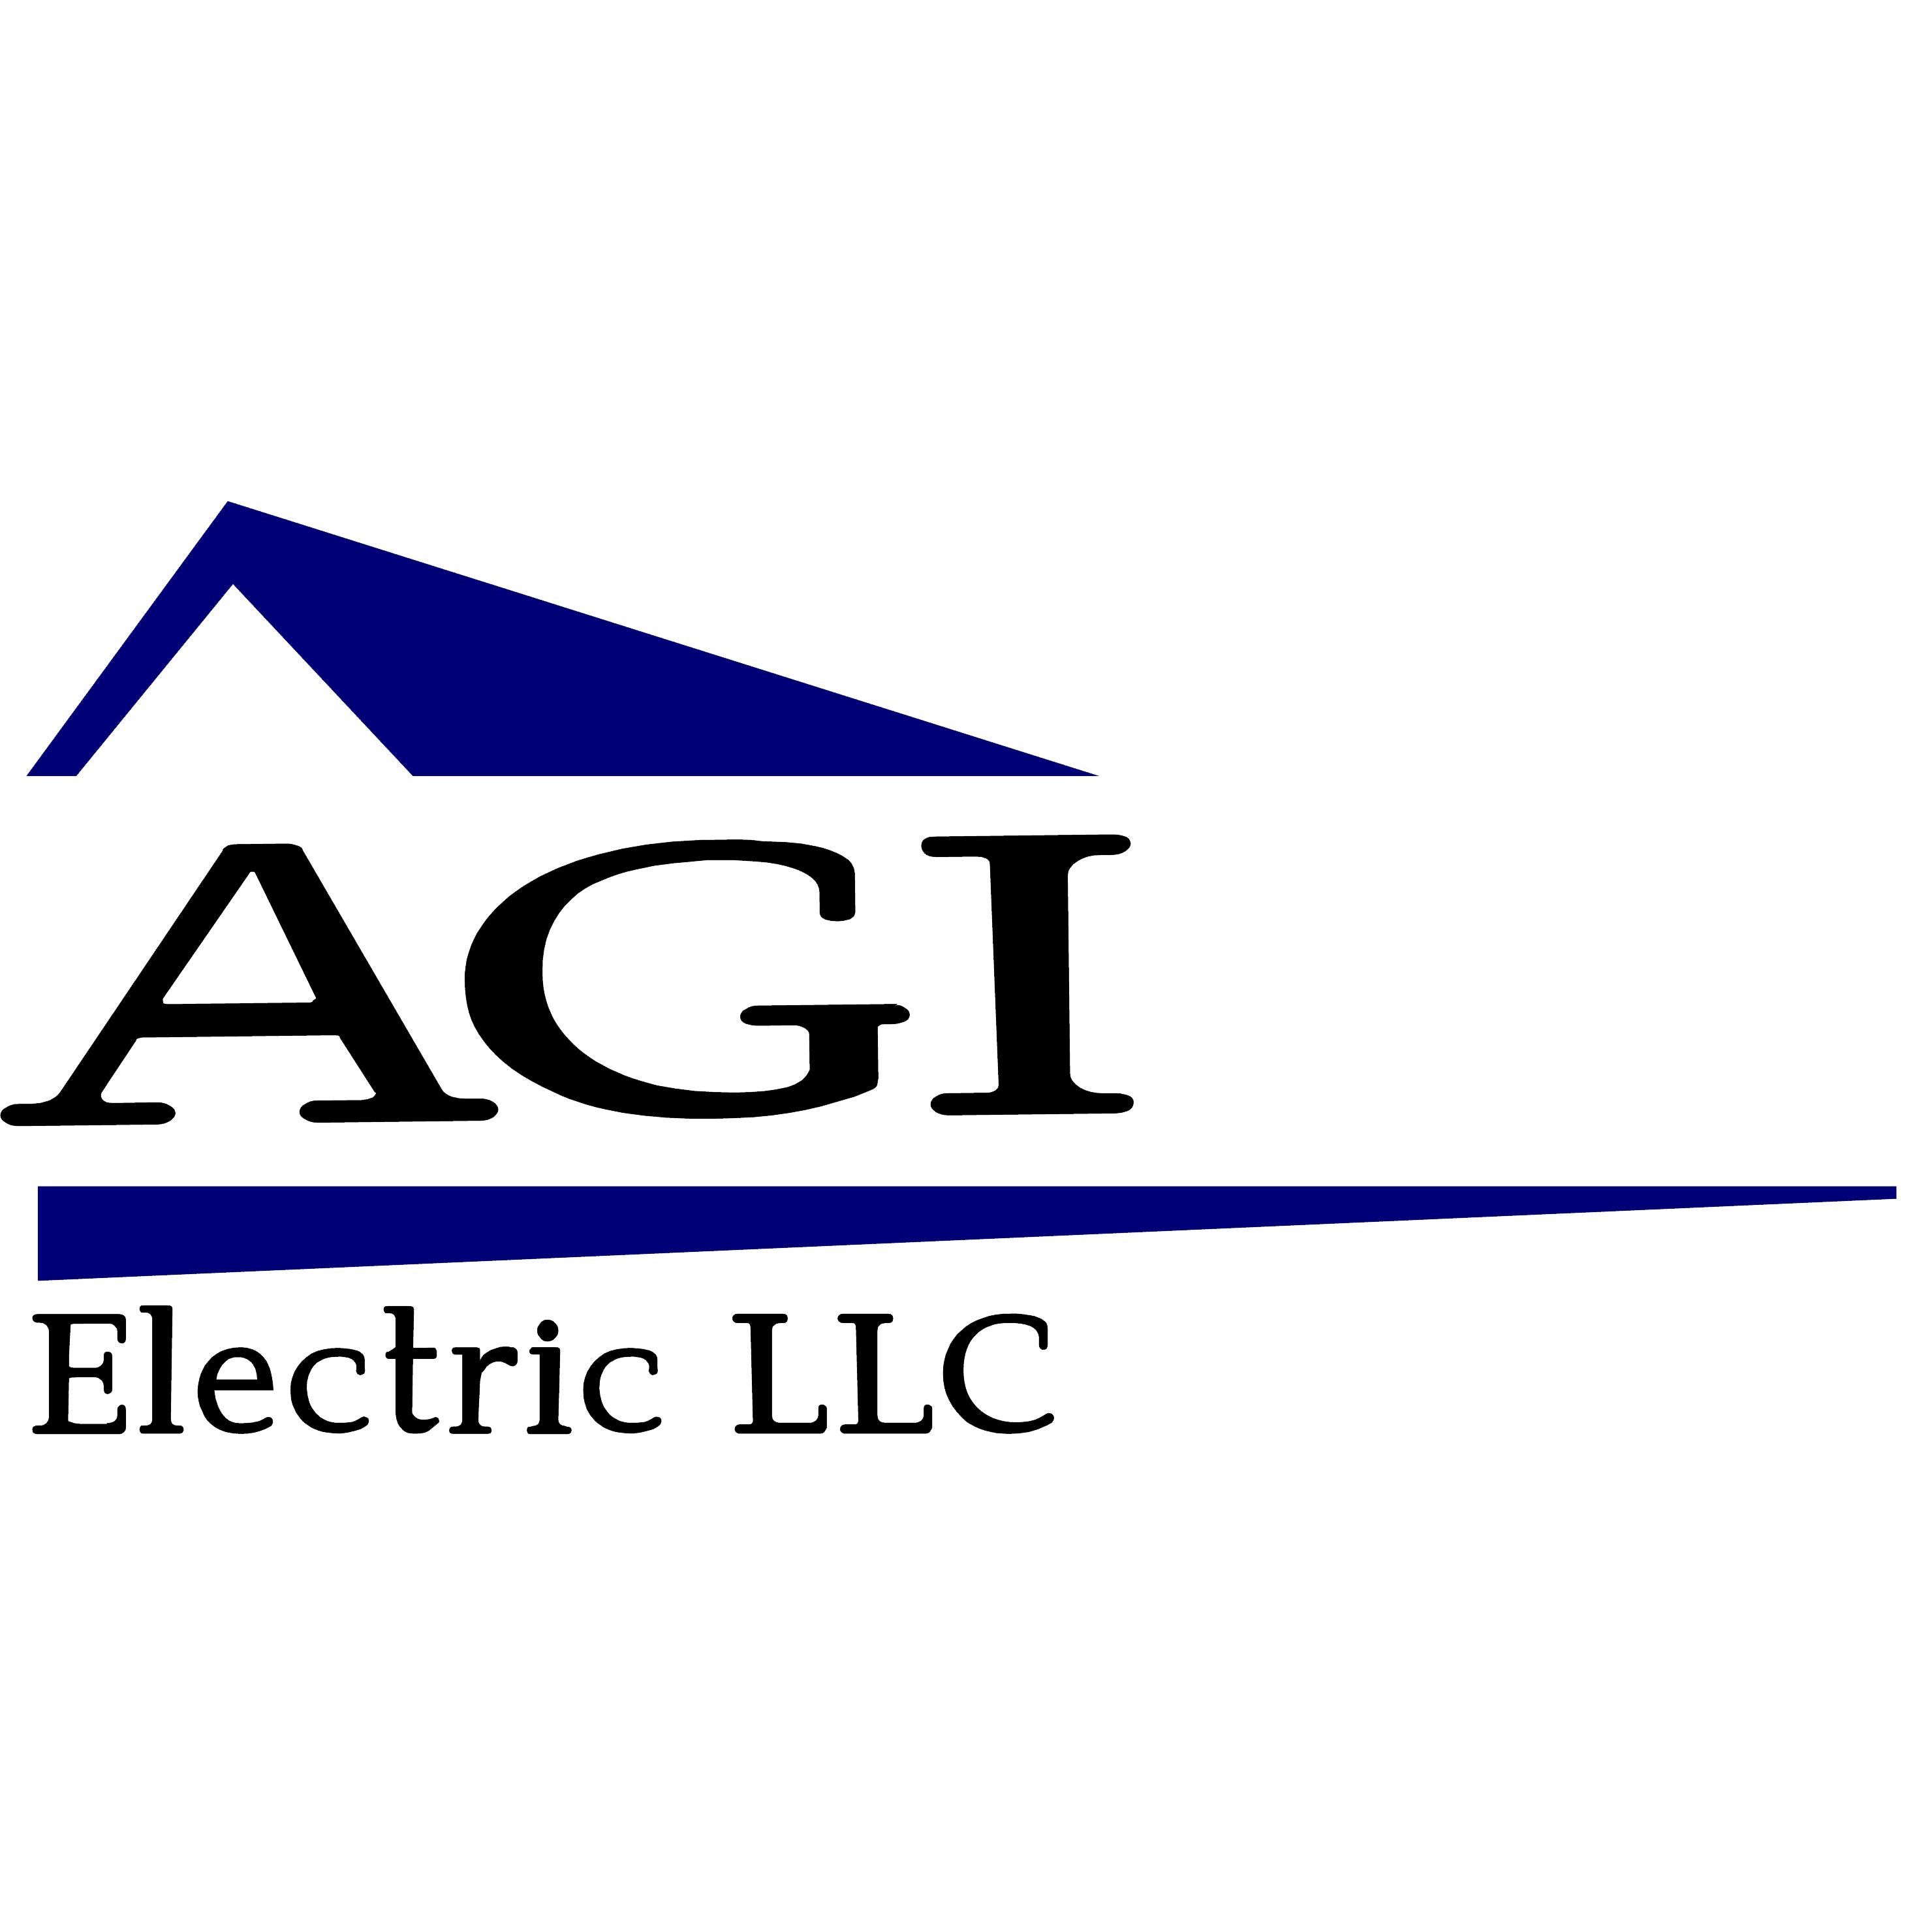 AGI Electric LLC image 0